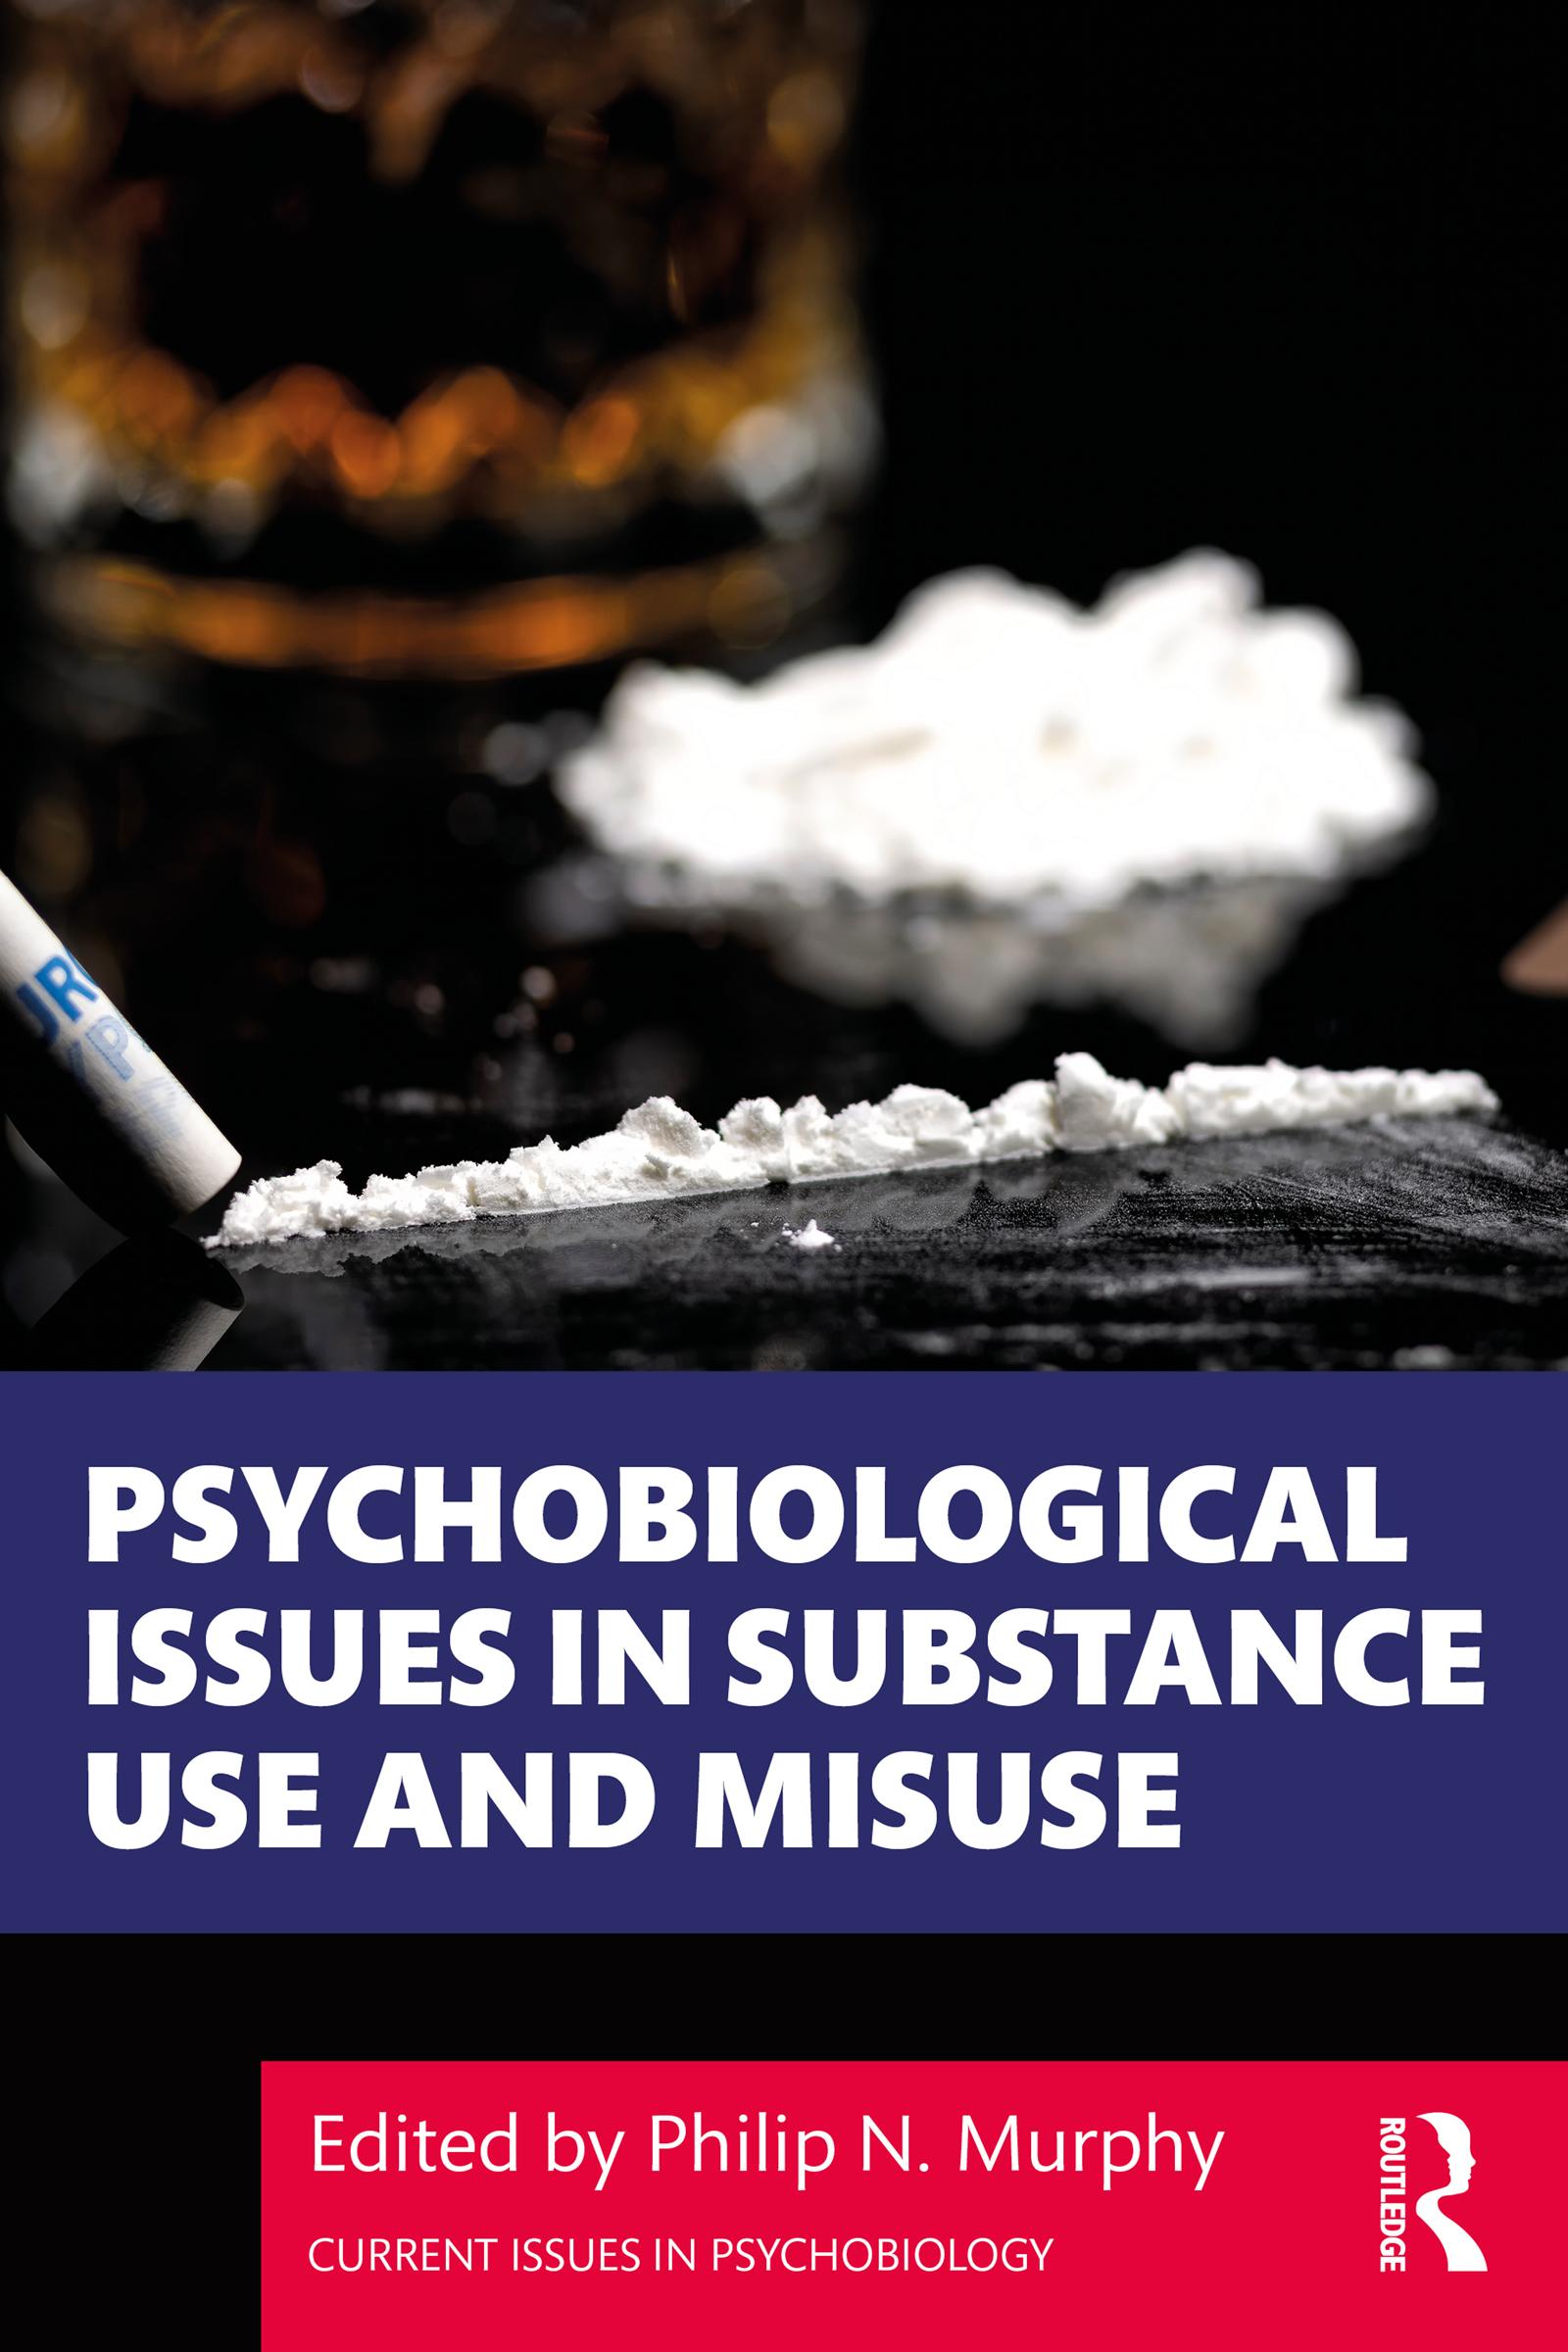 Methamphetamine Use Disorder